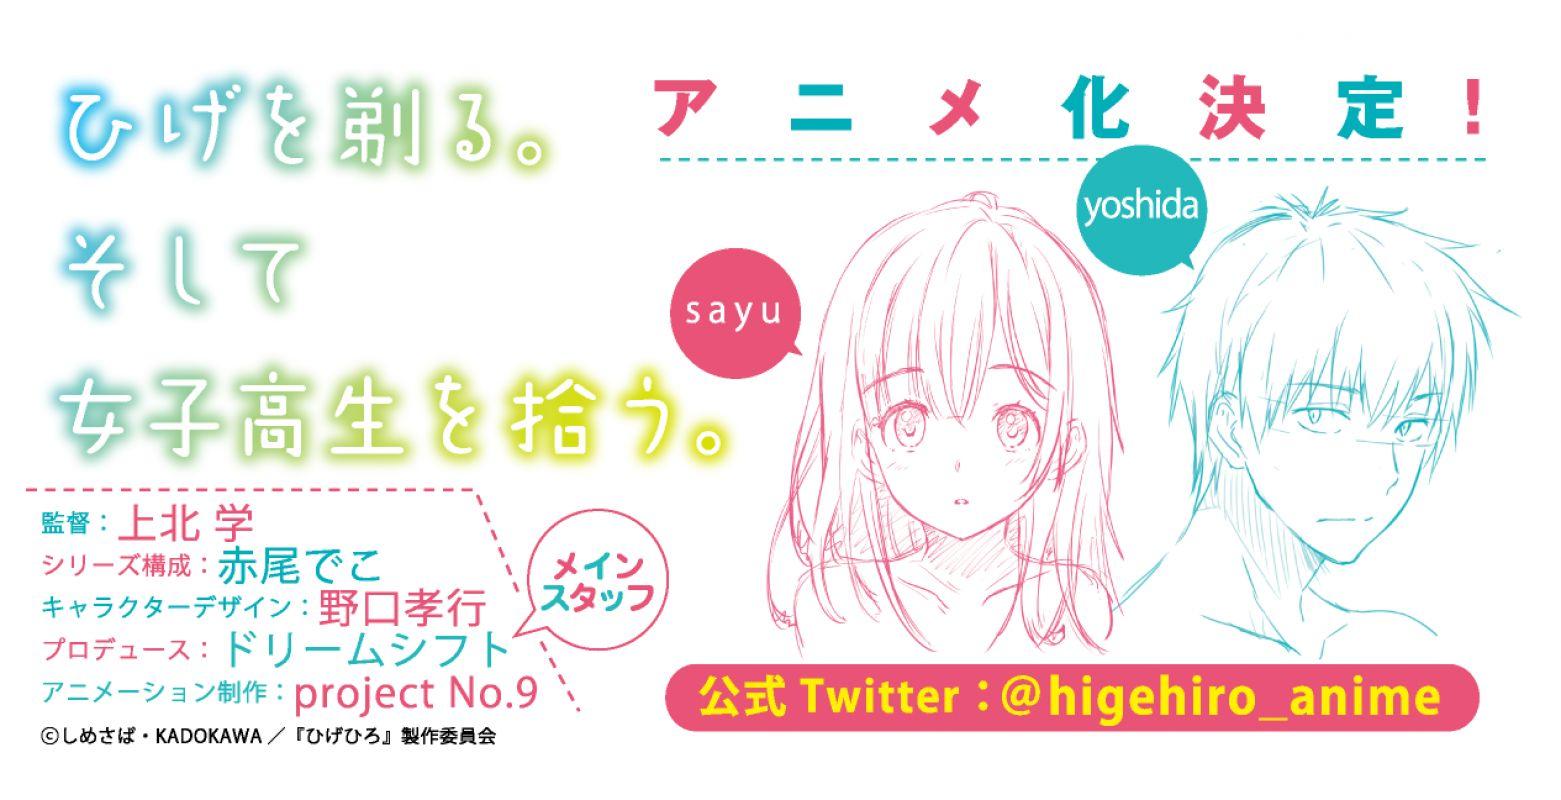 L'animé Hige Wo Soru. Soshite Joshi Kosei o Hirou. dévoile son staff et ses chara-designs !